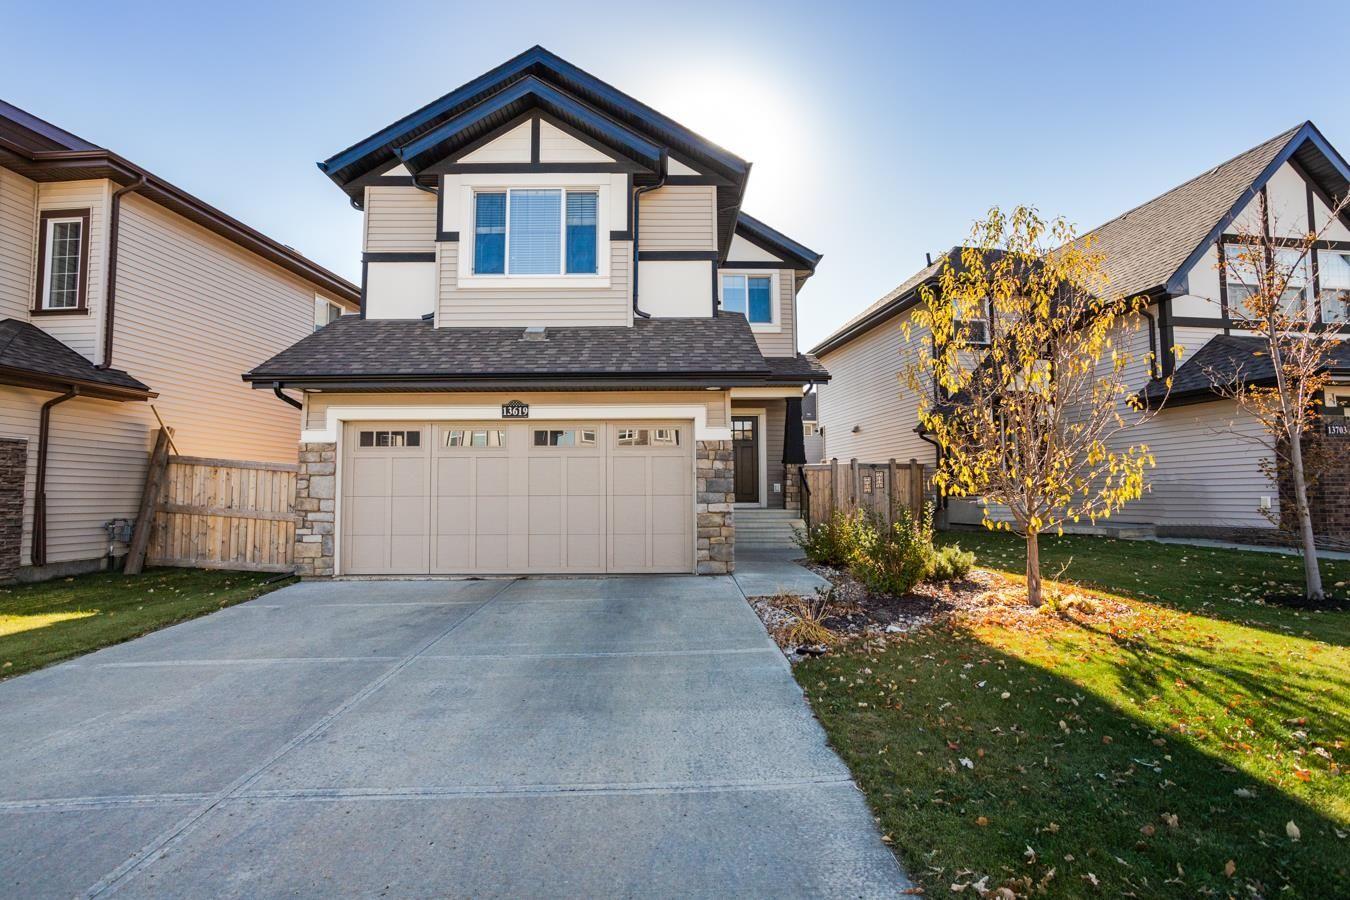 Main Photo: 13619 165 Avenue in Edmonton: Zone 27 House for sale : MLS®# E4266422